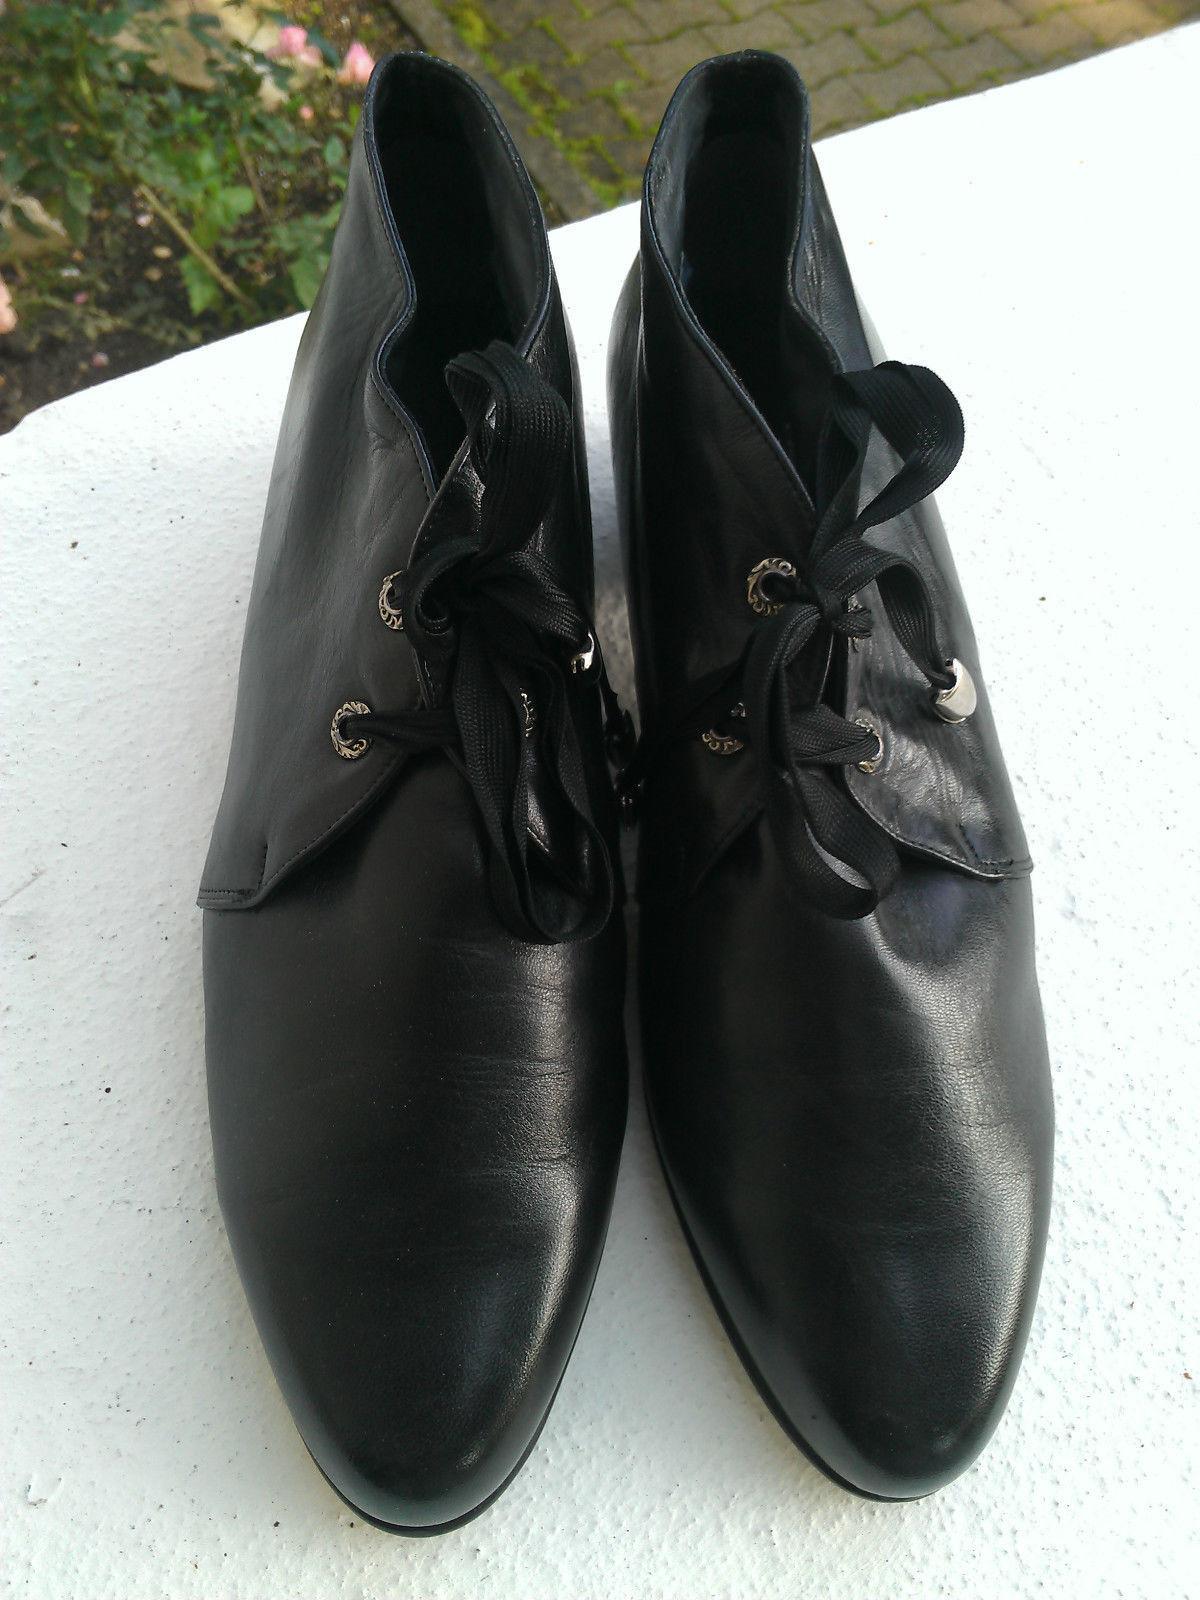 Gr. 8,5 42 ? Schwarze Schuhe NEU Halbschuhe gefüttert LEDER  Marke K& S edel